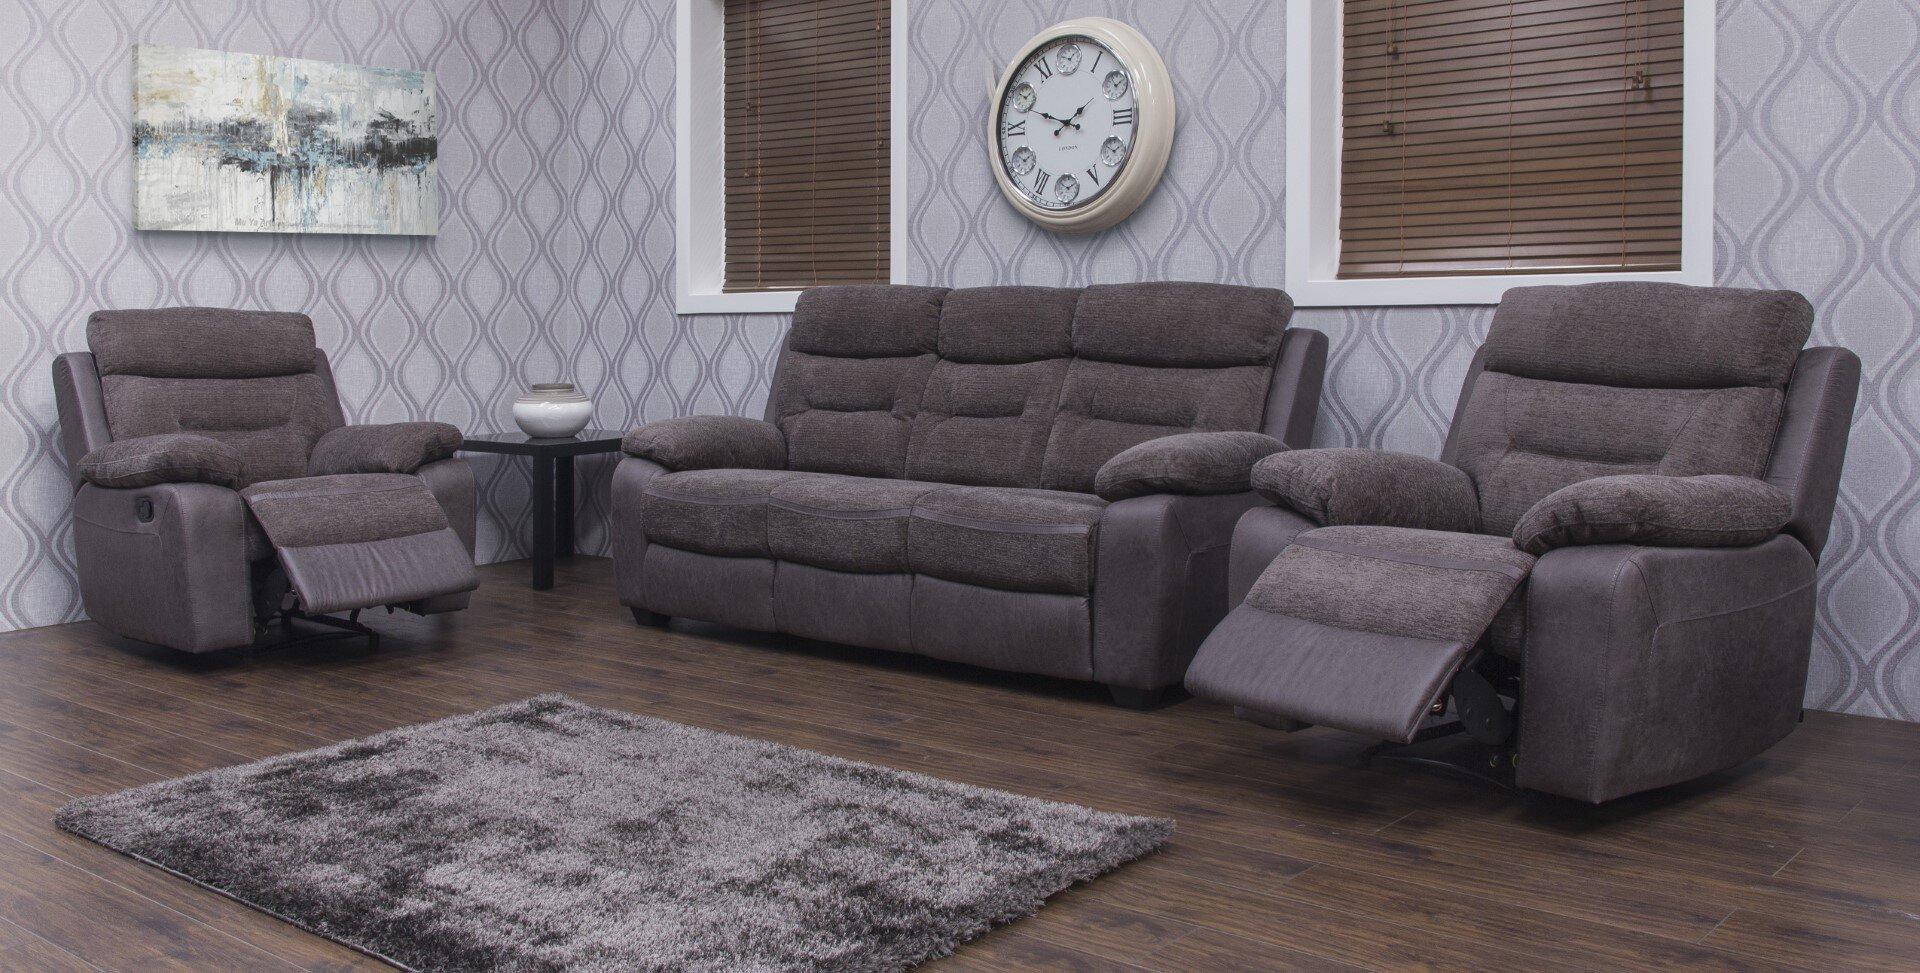 Melody Fabric Sofa - Dark Grey / Charcoal 3